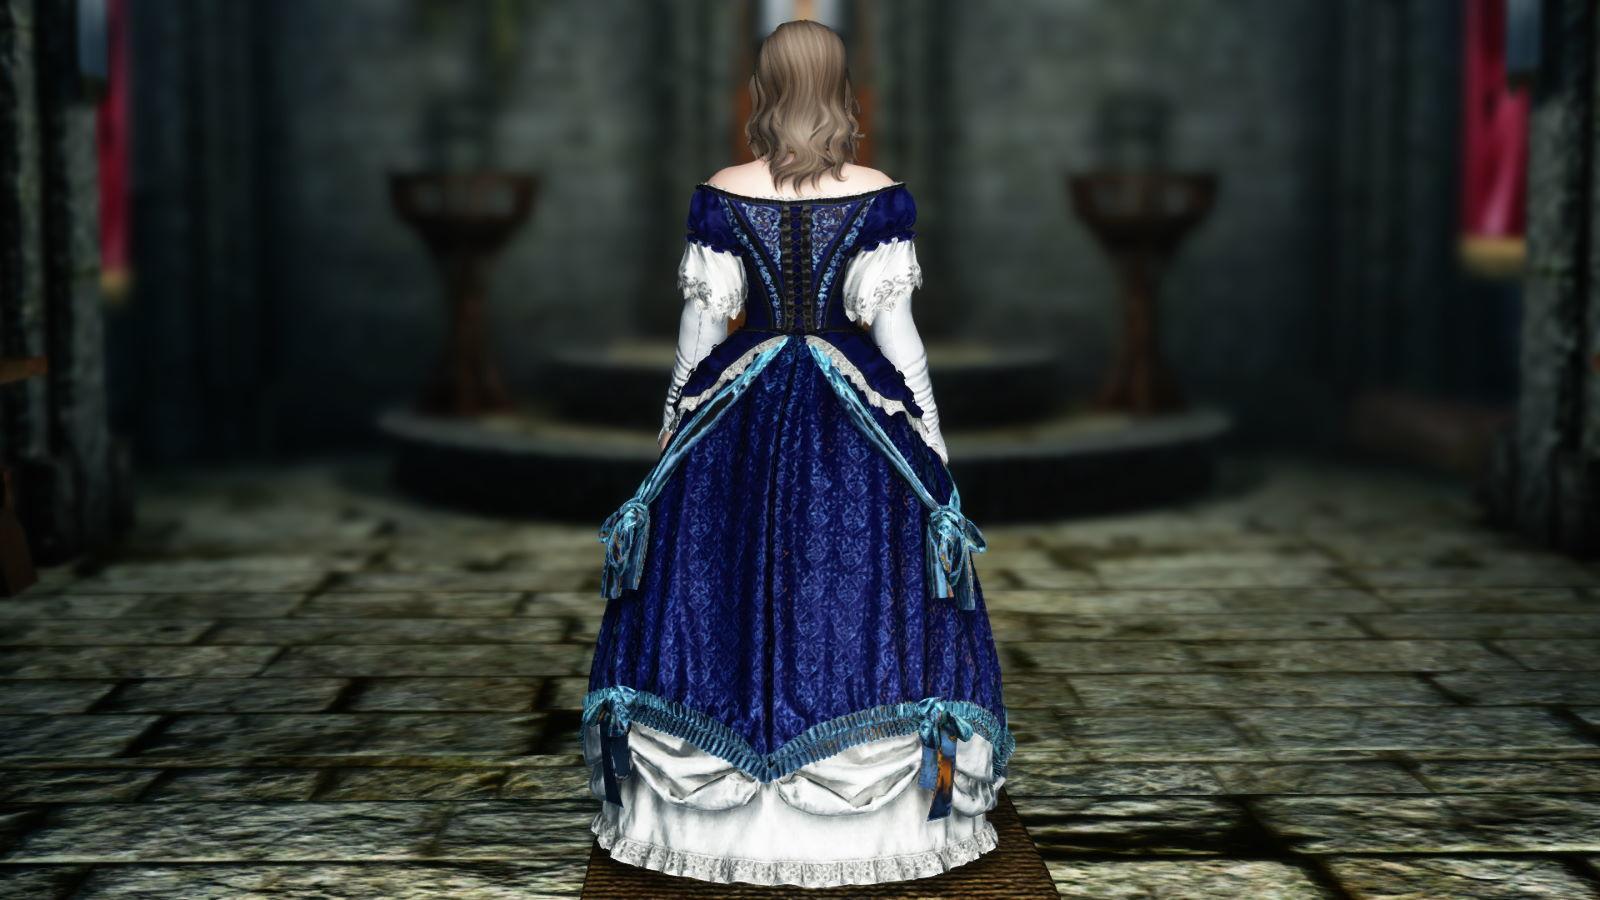 FullInuEliseDressSK 221-1 Pose Dress Blue 1